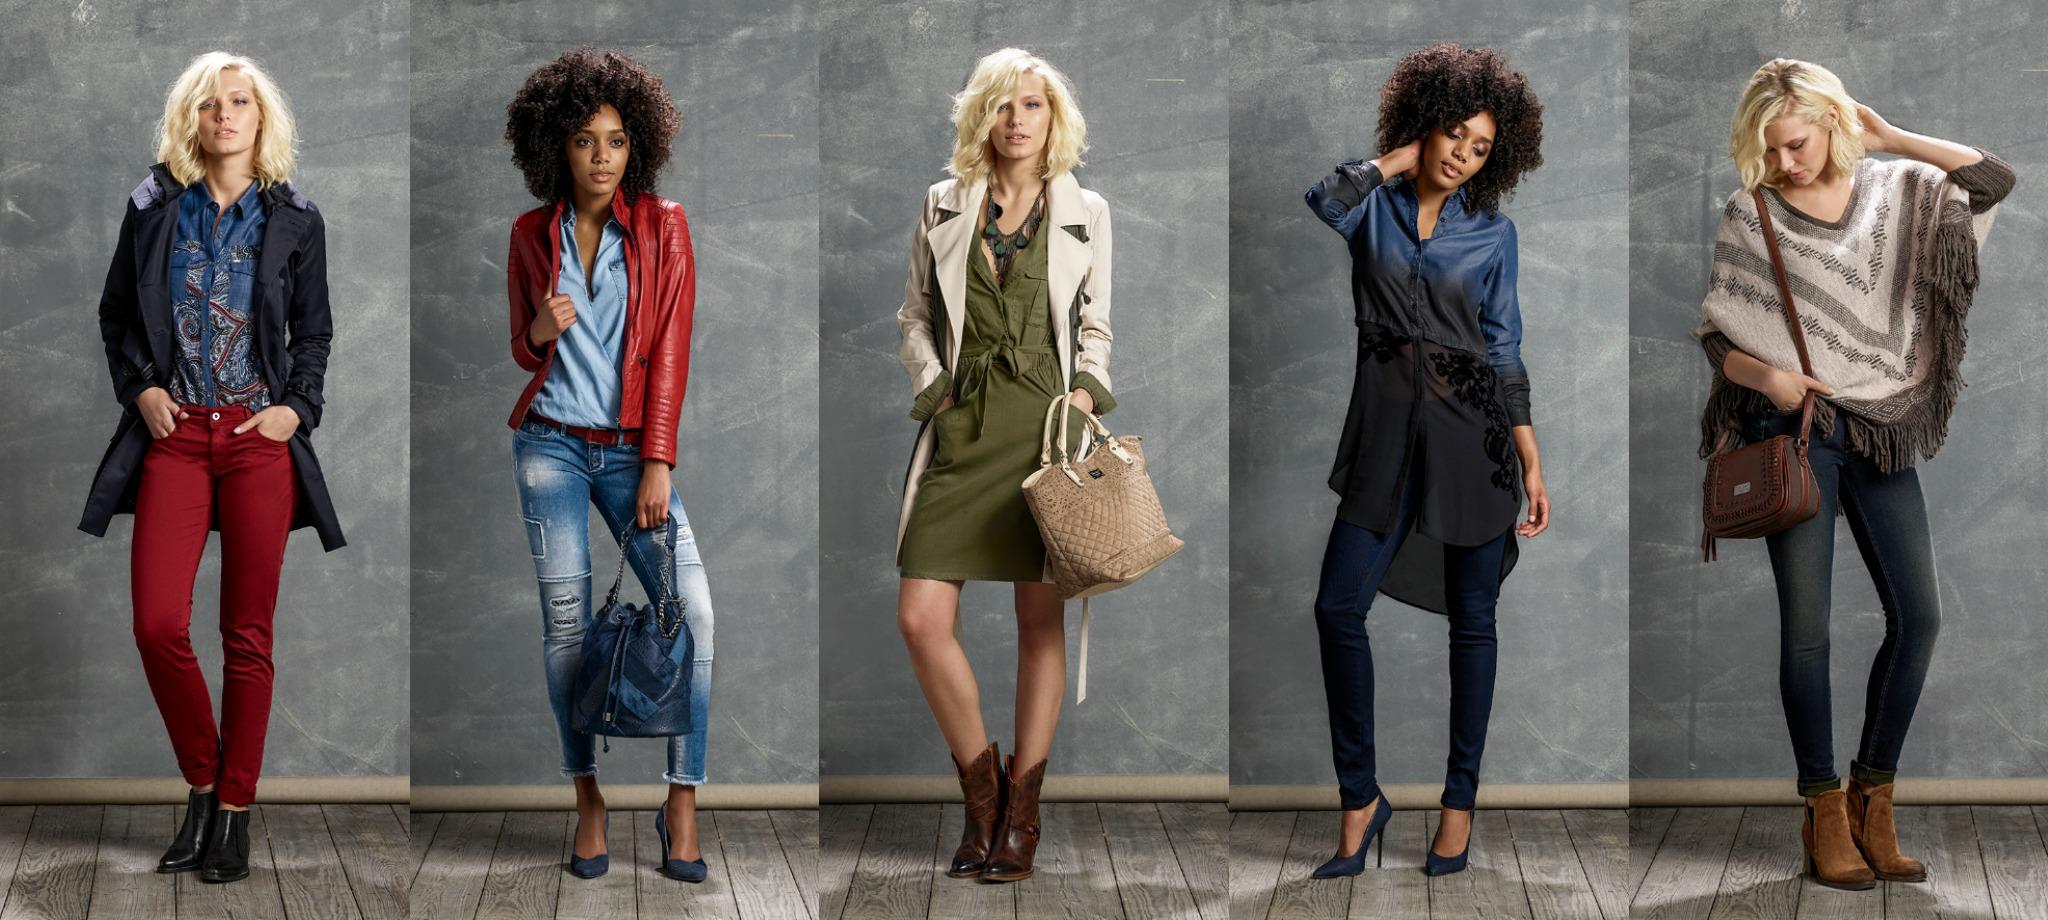 outfits tendencias para otoño invierno 2016,2017